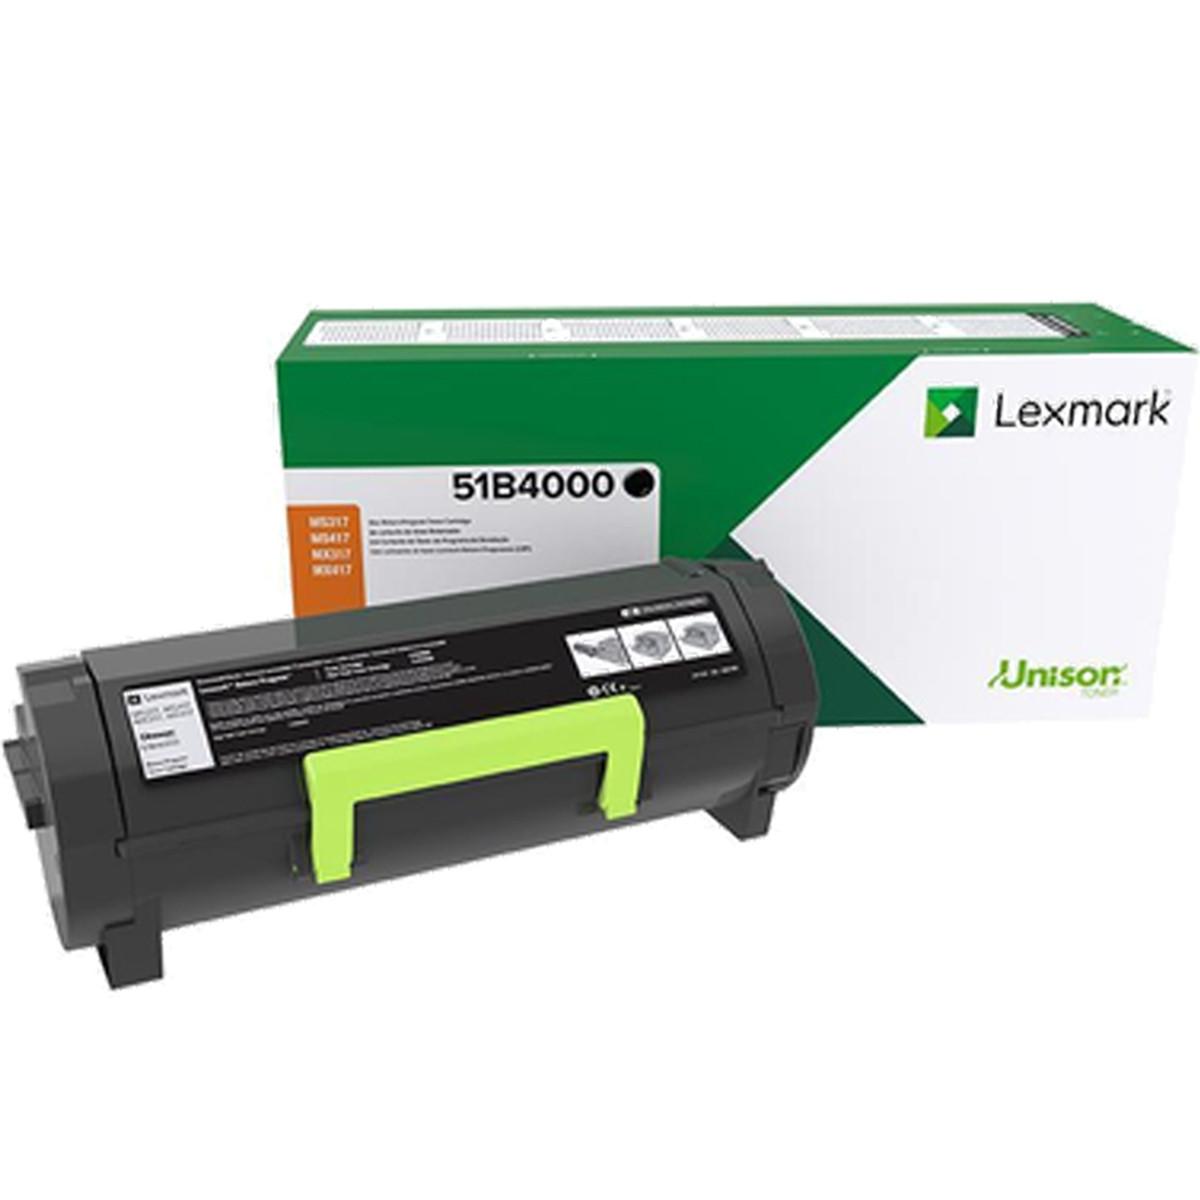 Toner Lexmark 51B4000 51B4   MX317 MX417 MX517 MS317 MS417 MS517 317DN 417DE 517DE   Original 2.5k